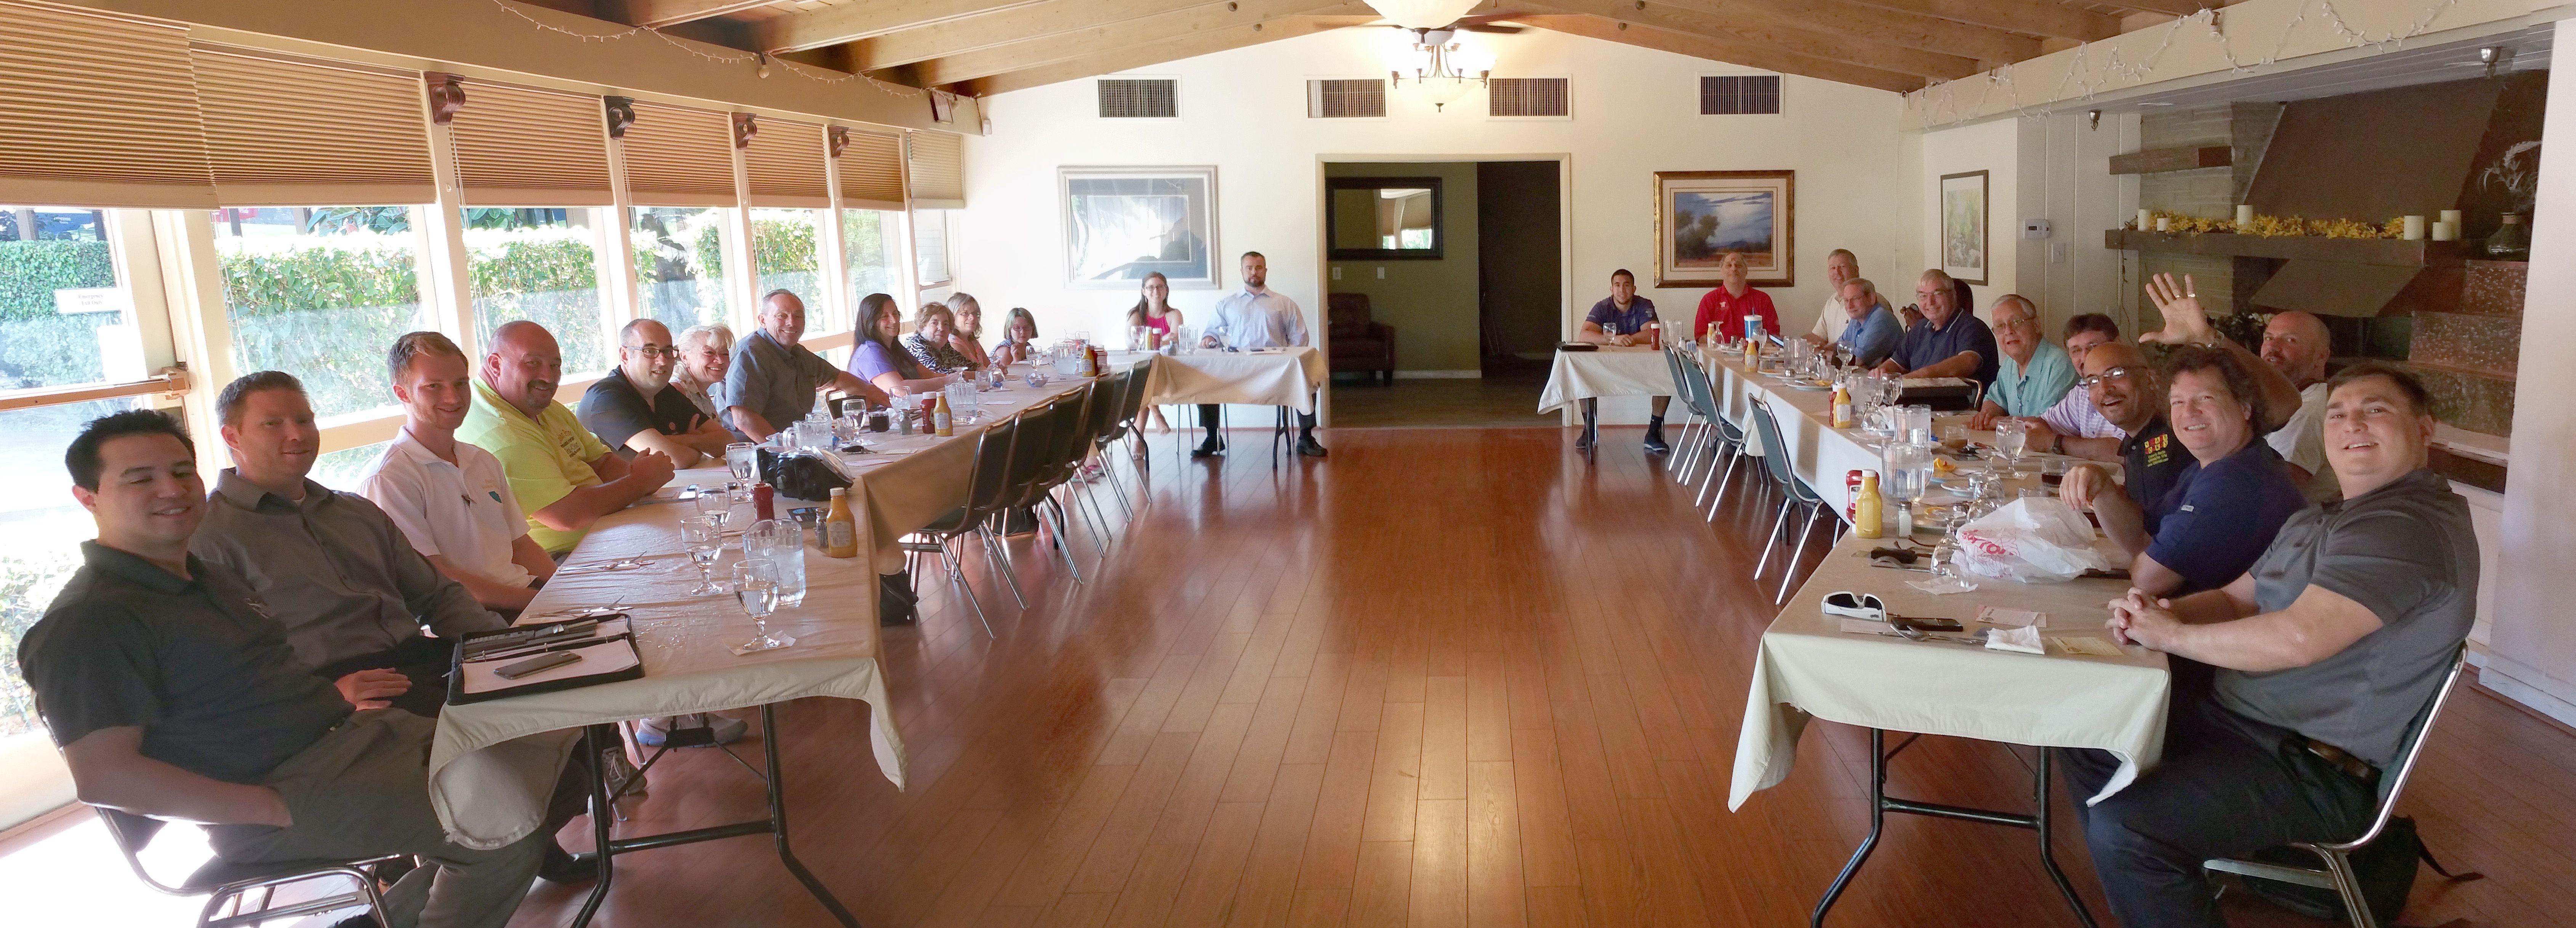 East Valley Business Network | Mesa, AZ